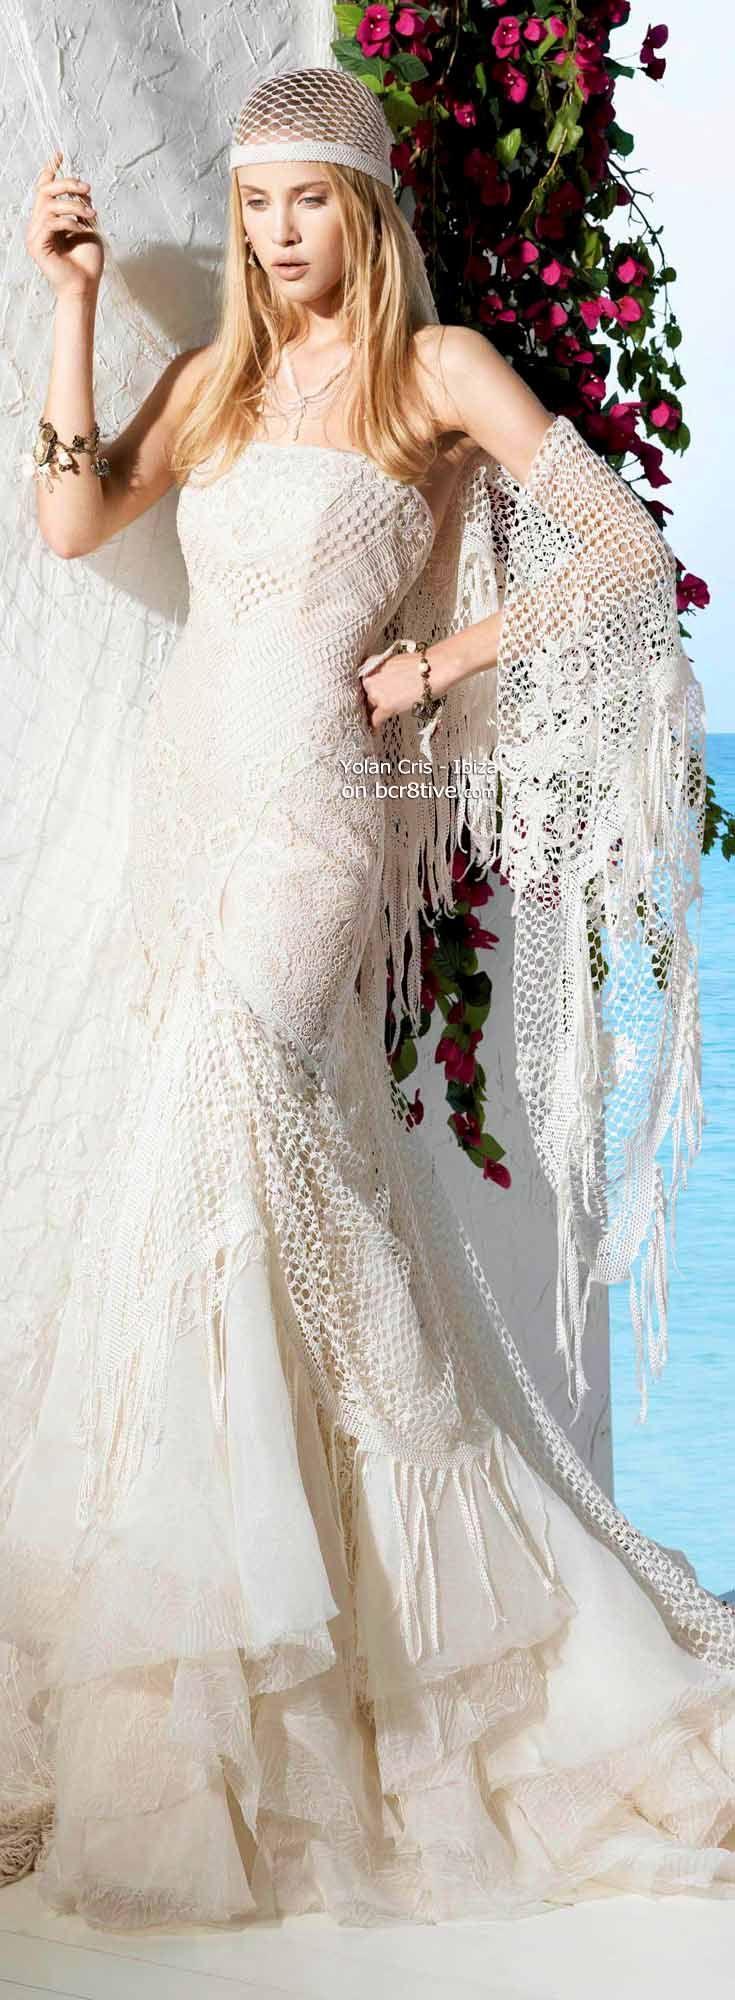 Yolan Cris 2013 Ibiza Bridal Collection   Pinterest   Hochzeitskleid ...